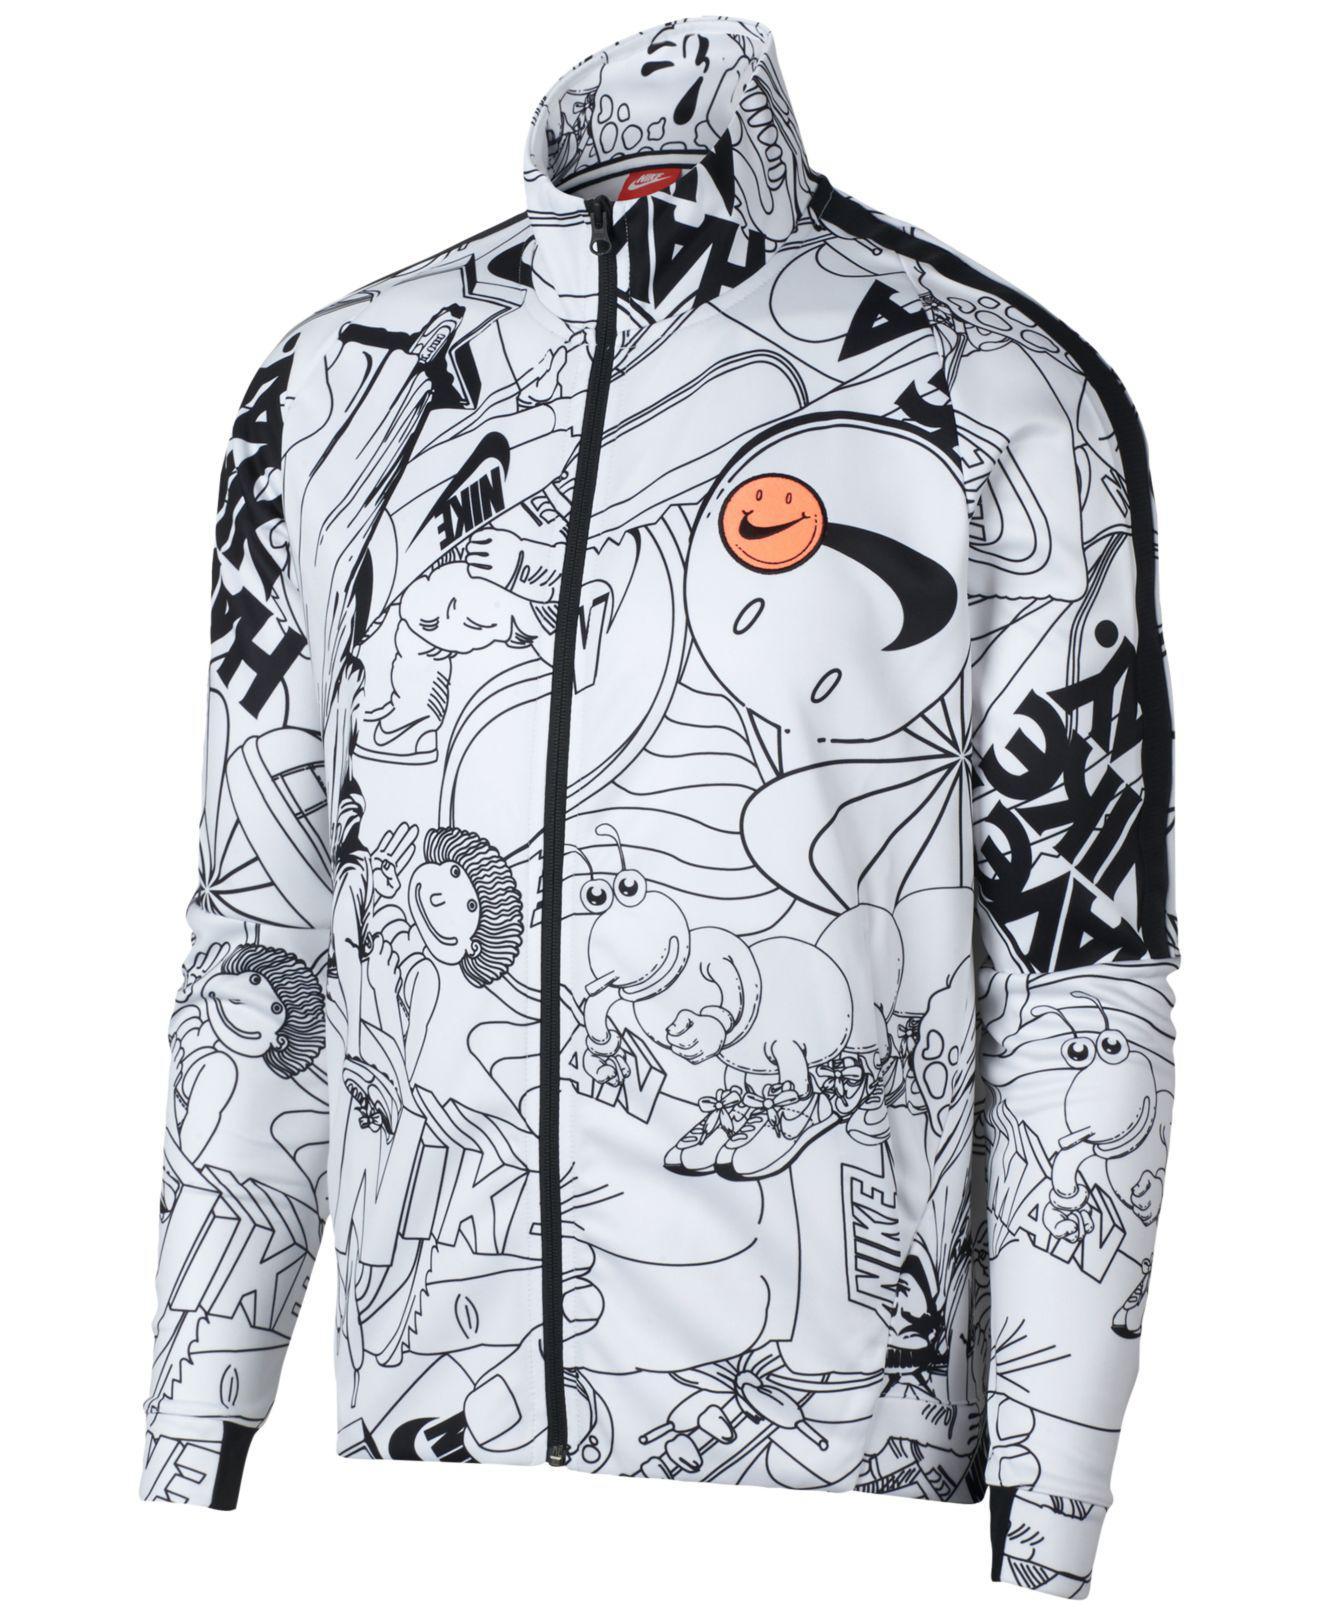 acbe7977701a Lyst - Nike Sportswear Graphic Jacket for Men